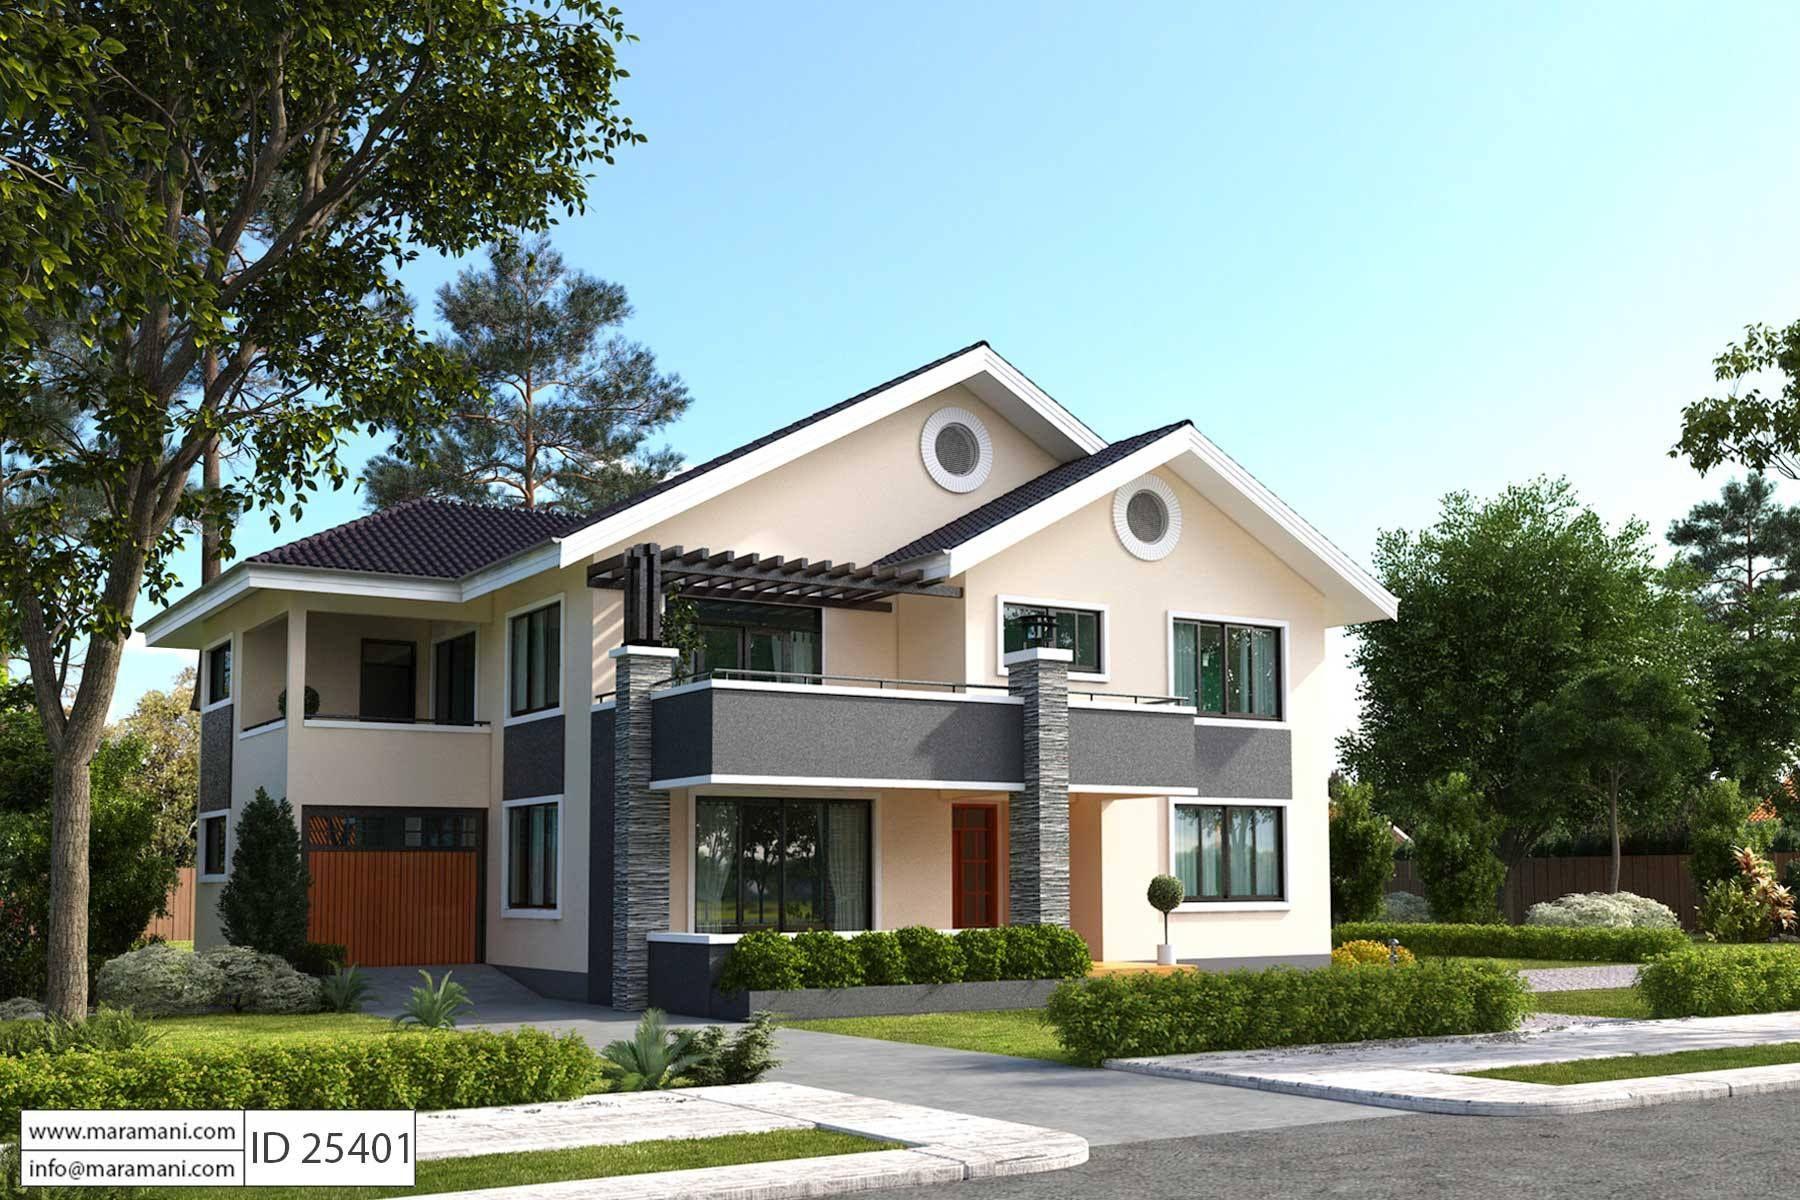 5 Bedroom House Plan ID 25401 Floor Plans in 2020 5